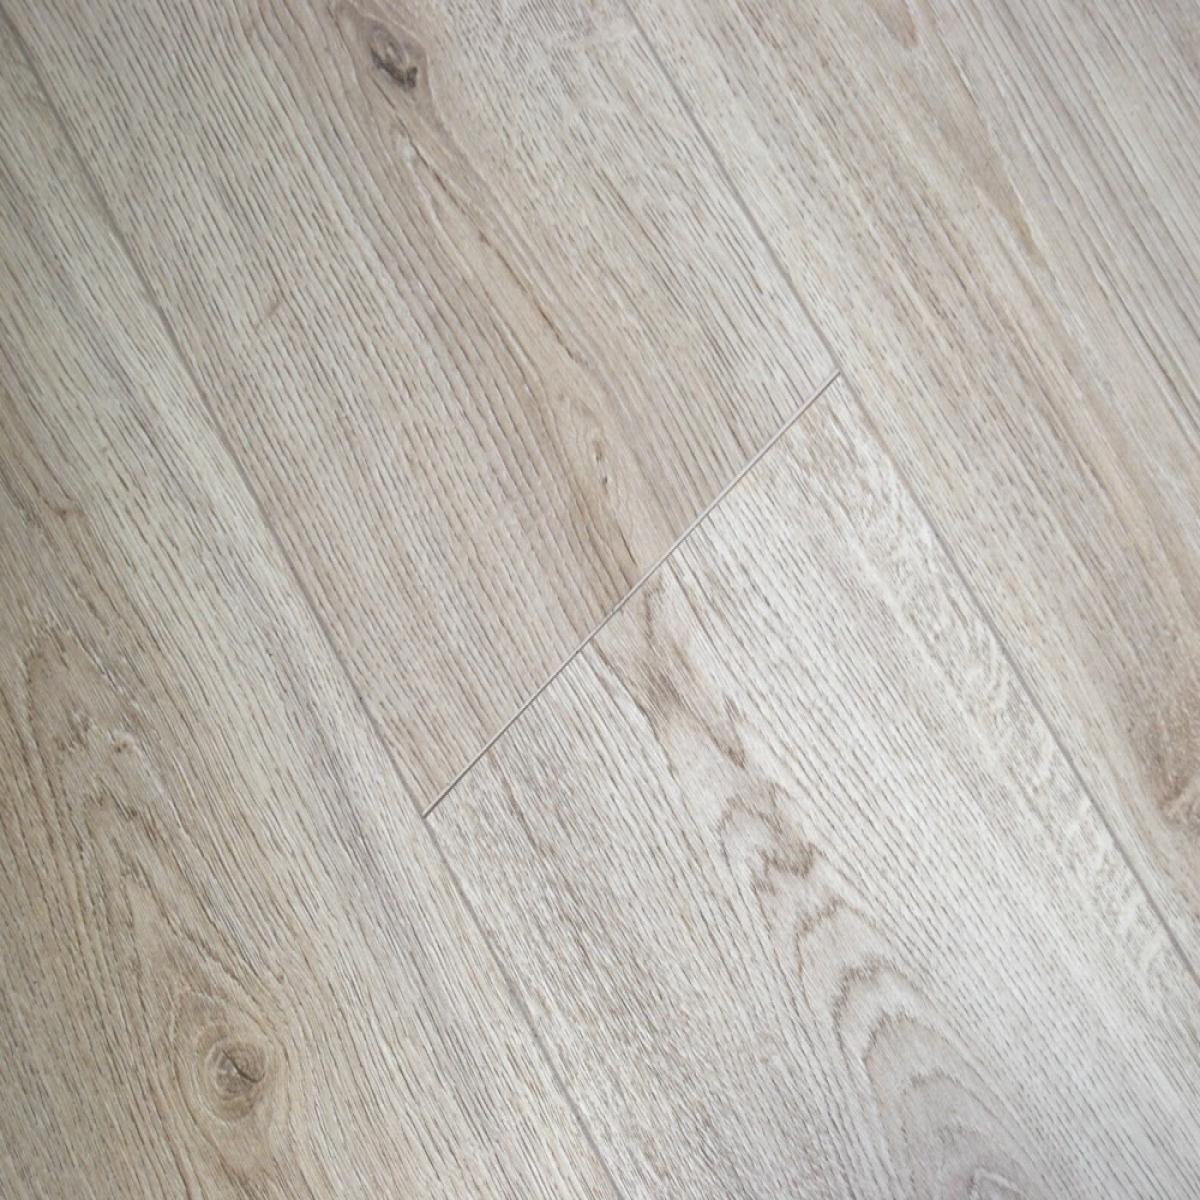 Trend Oak Grey Laminate Flooring, Laminate Flooring Brand Names